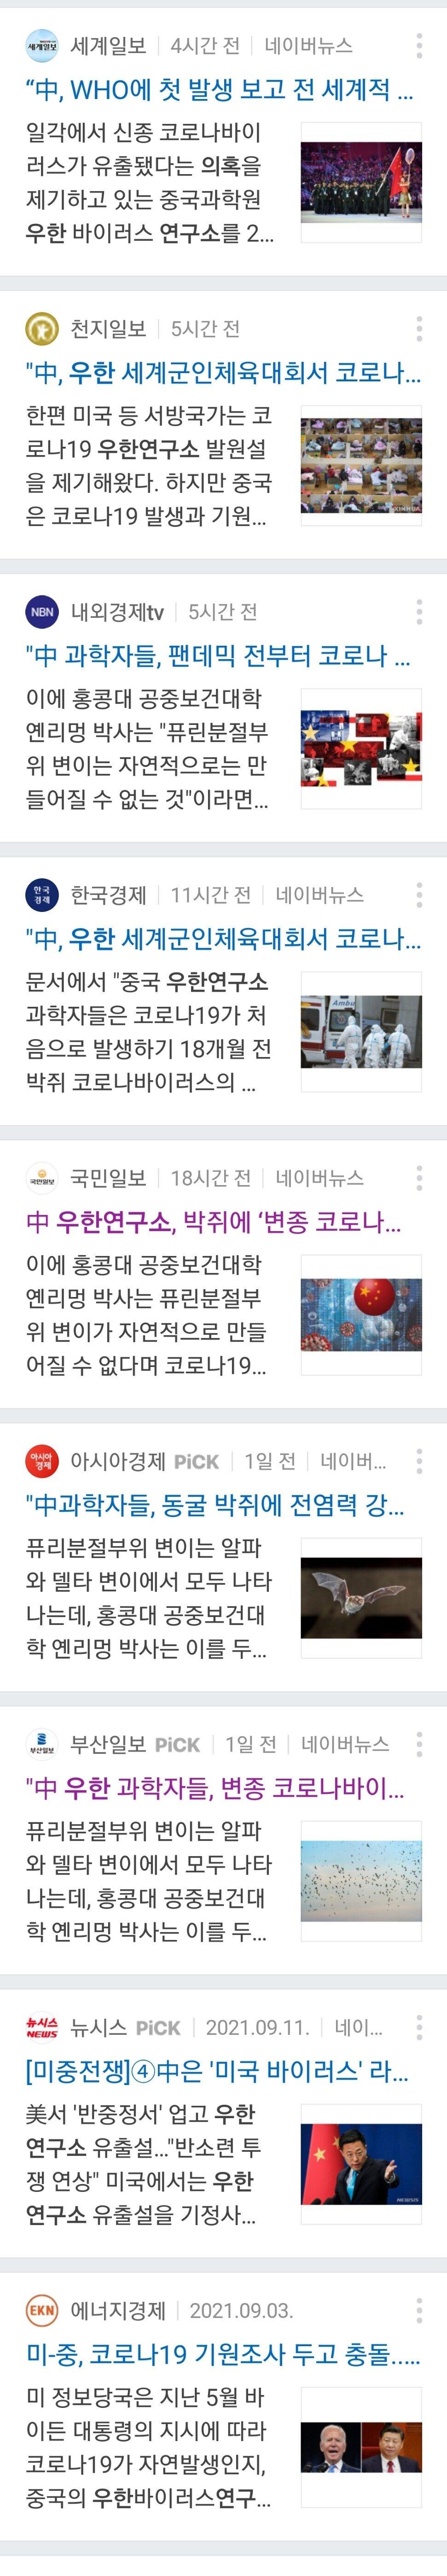 Screenshot_20210923-203338_Samsung Internet.jpg 중국 우한연구소에서 고의로 코로나 바이러스 전파 의혹.jpg